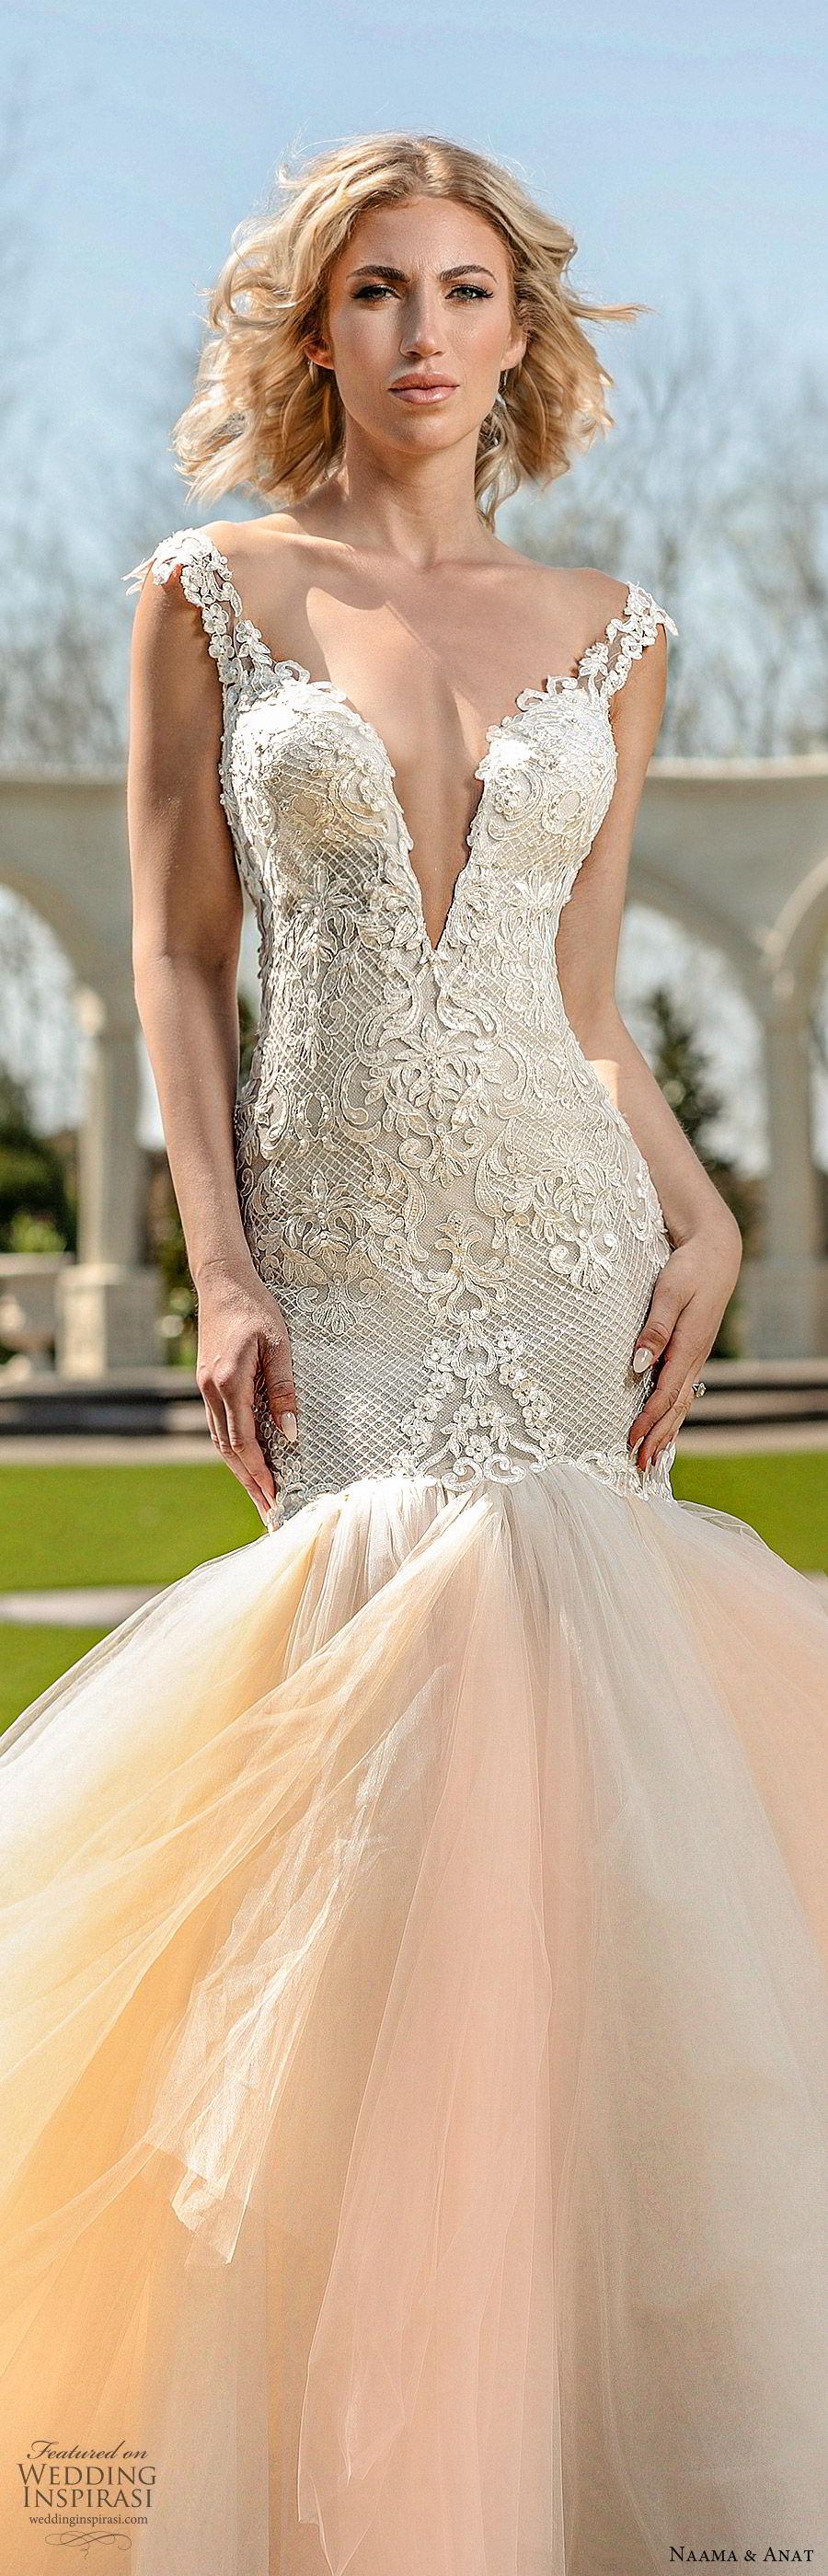 naama anat spring 2020 bridal cap sleeves split sweetheart neckline lace bodice ruffle skirt mermaid wedding dress (2) romantic chapel train open back blush lv